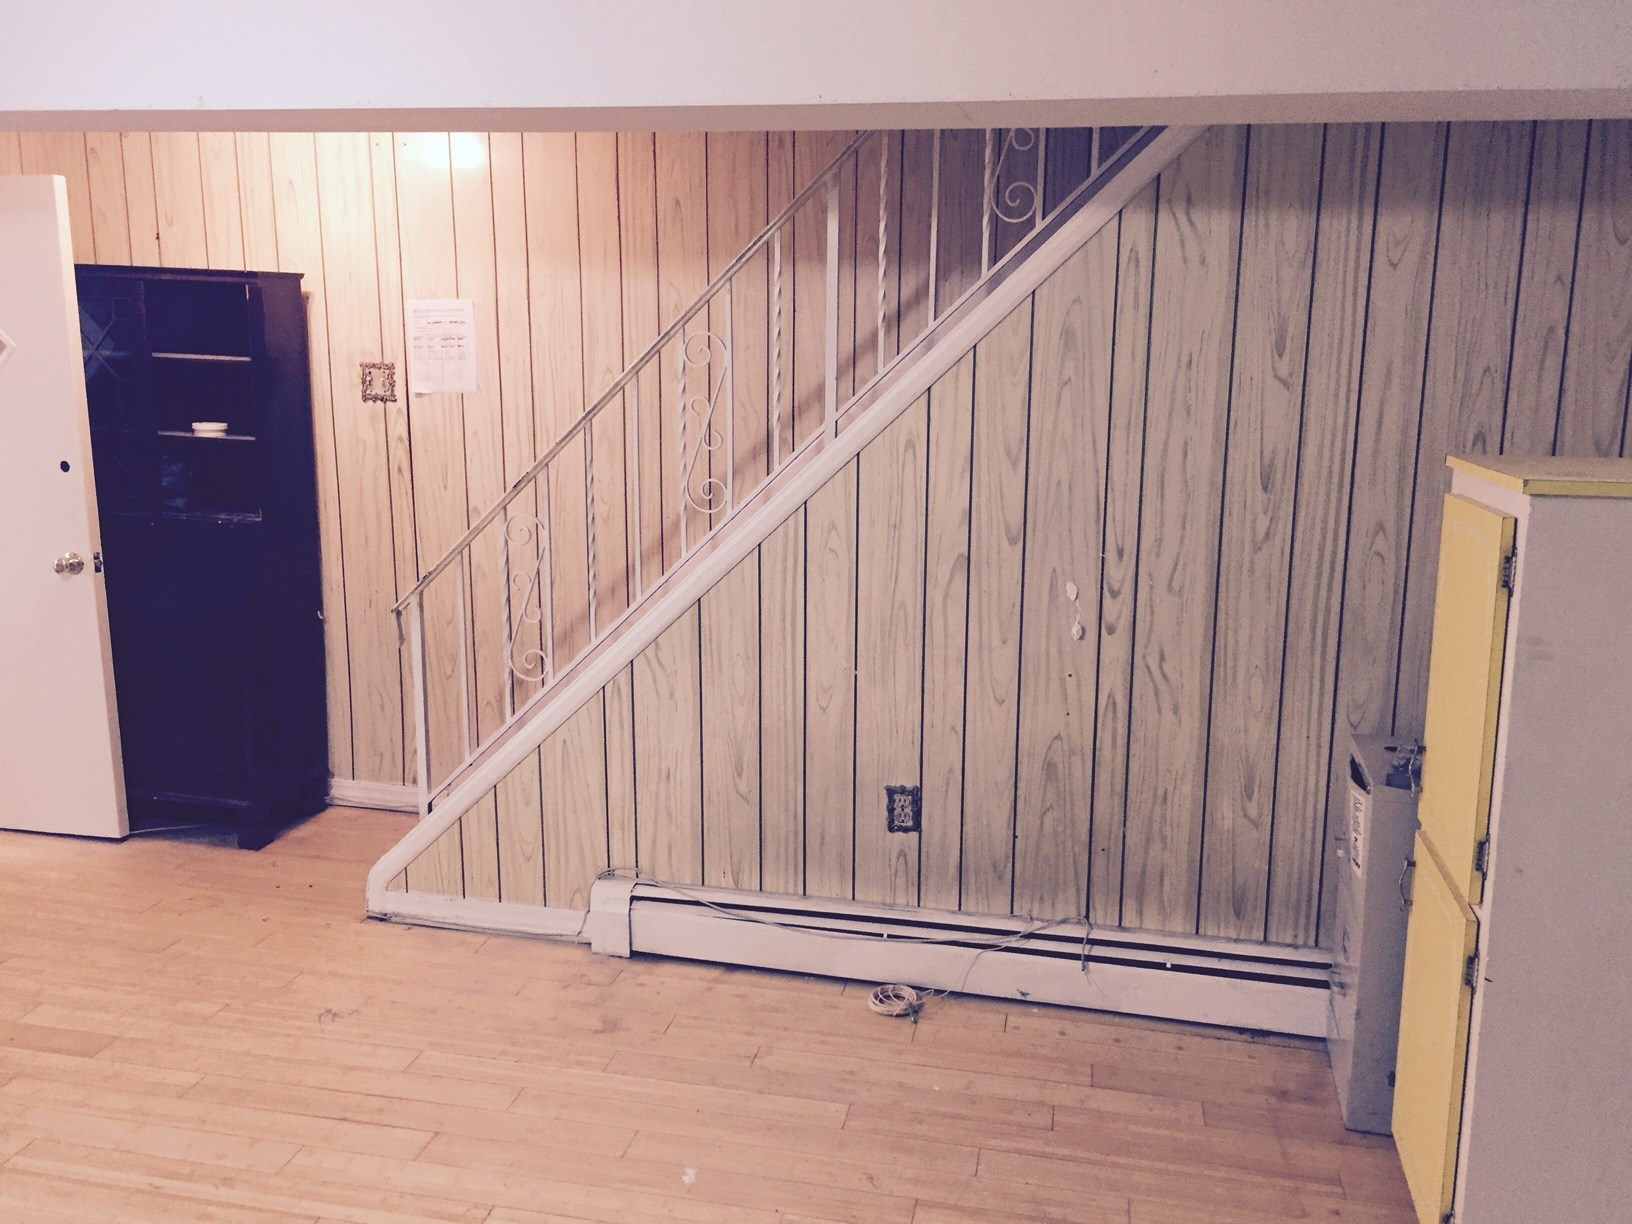 1 Bedroom Apartment In Jersey City Ethicsofbigdata Info